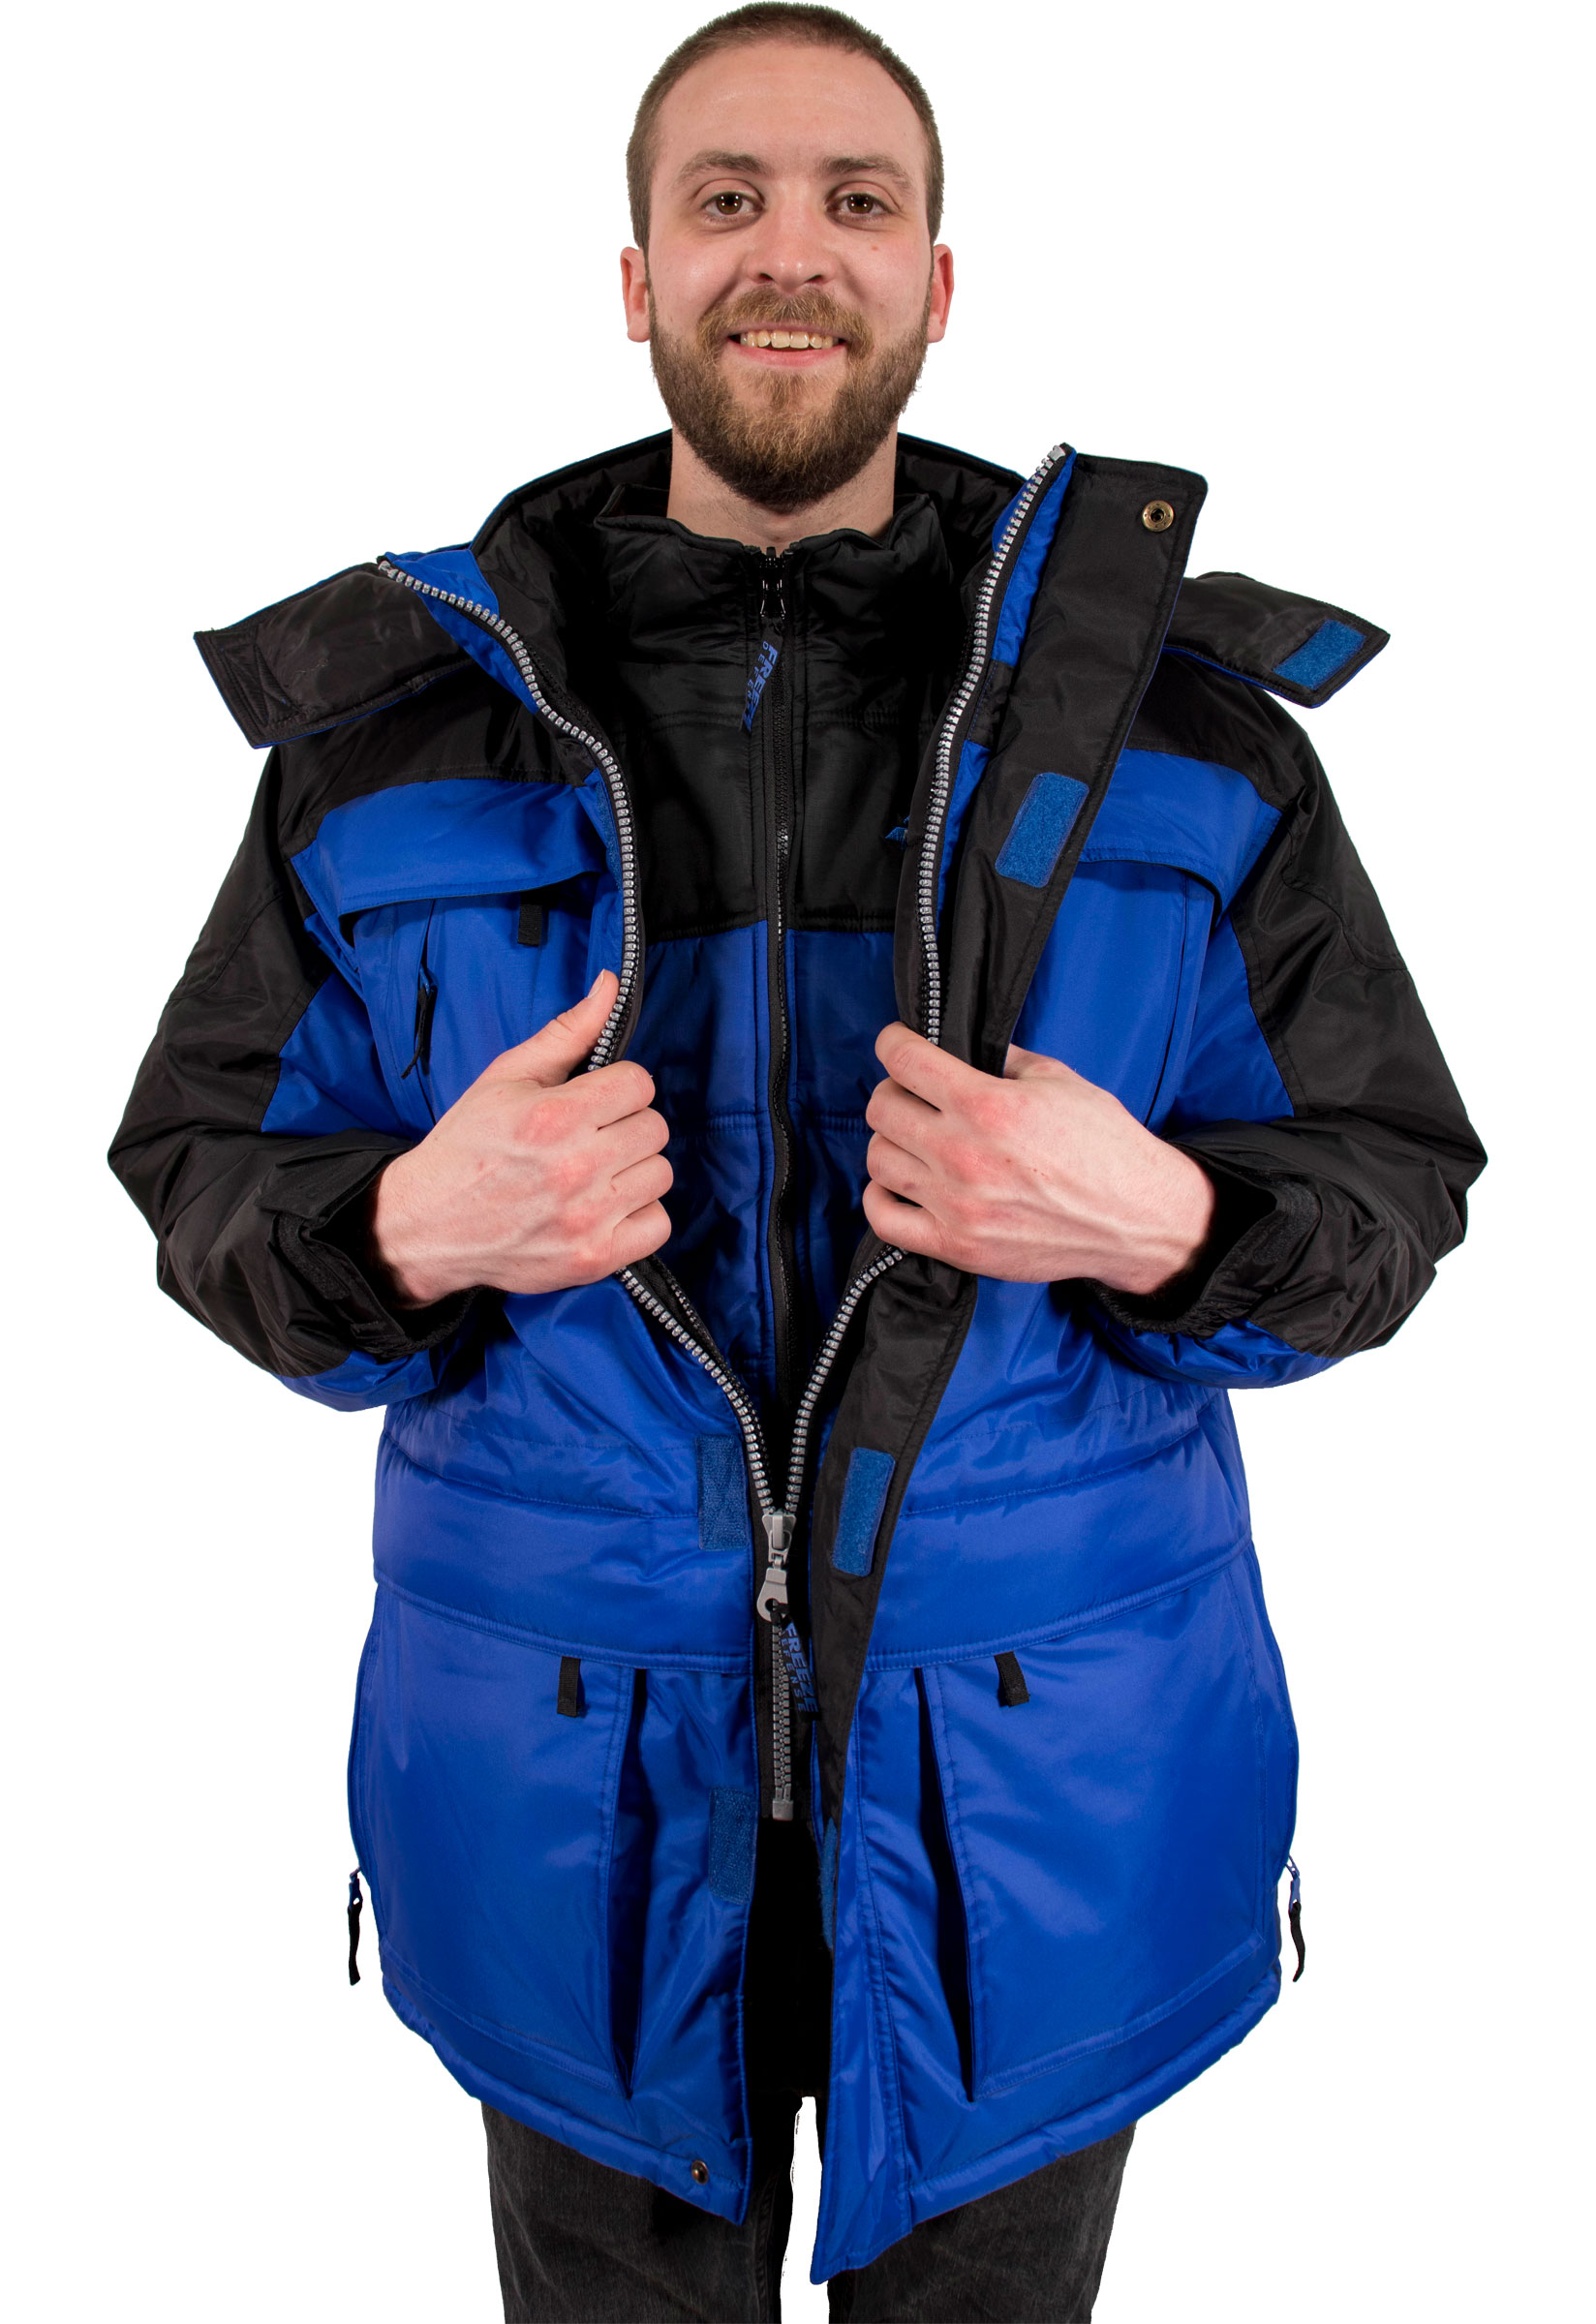 35486d981fe Freeze Defense Men s 3 in 1 Winter Coat. Our warmest coat that comes with a  vest ...